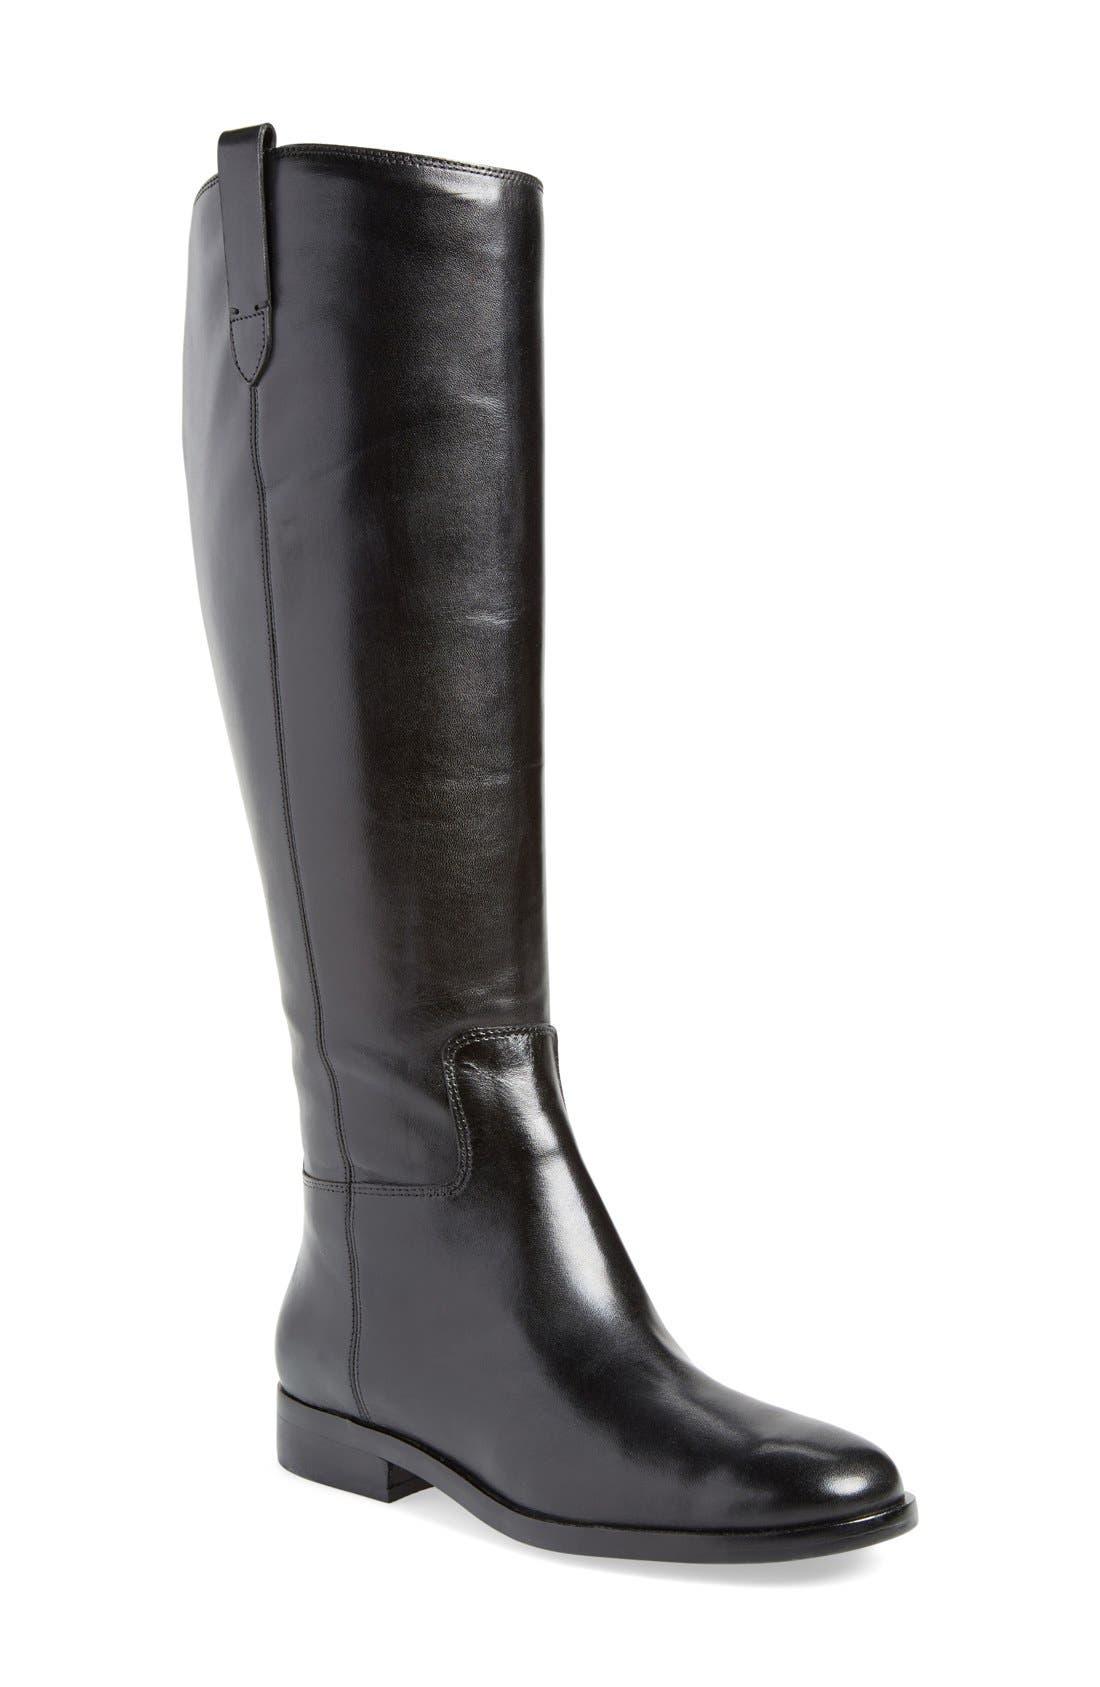 Alternate Image 1 Selected - Ivanka Trump 'Addee' Tall Riding Boot (Women)